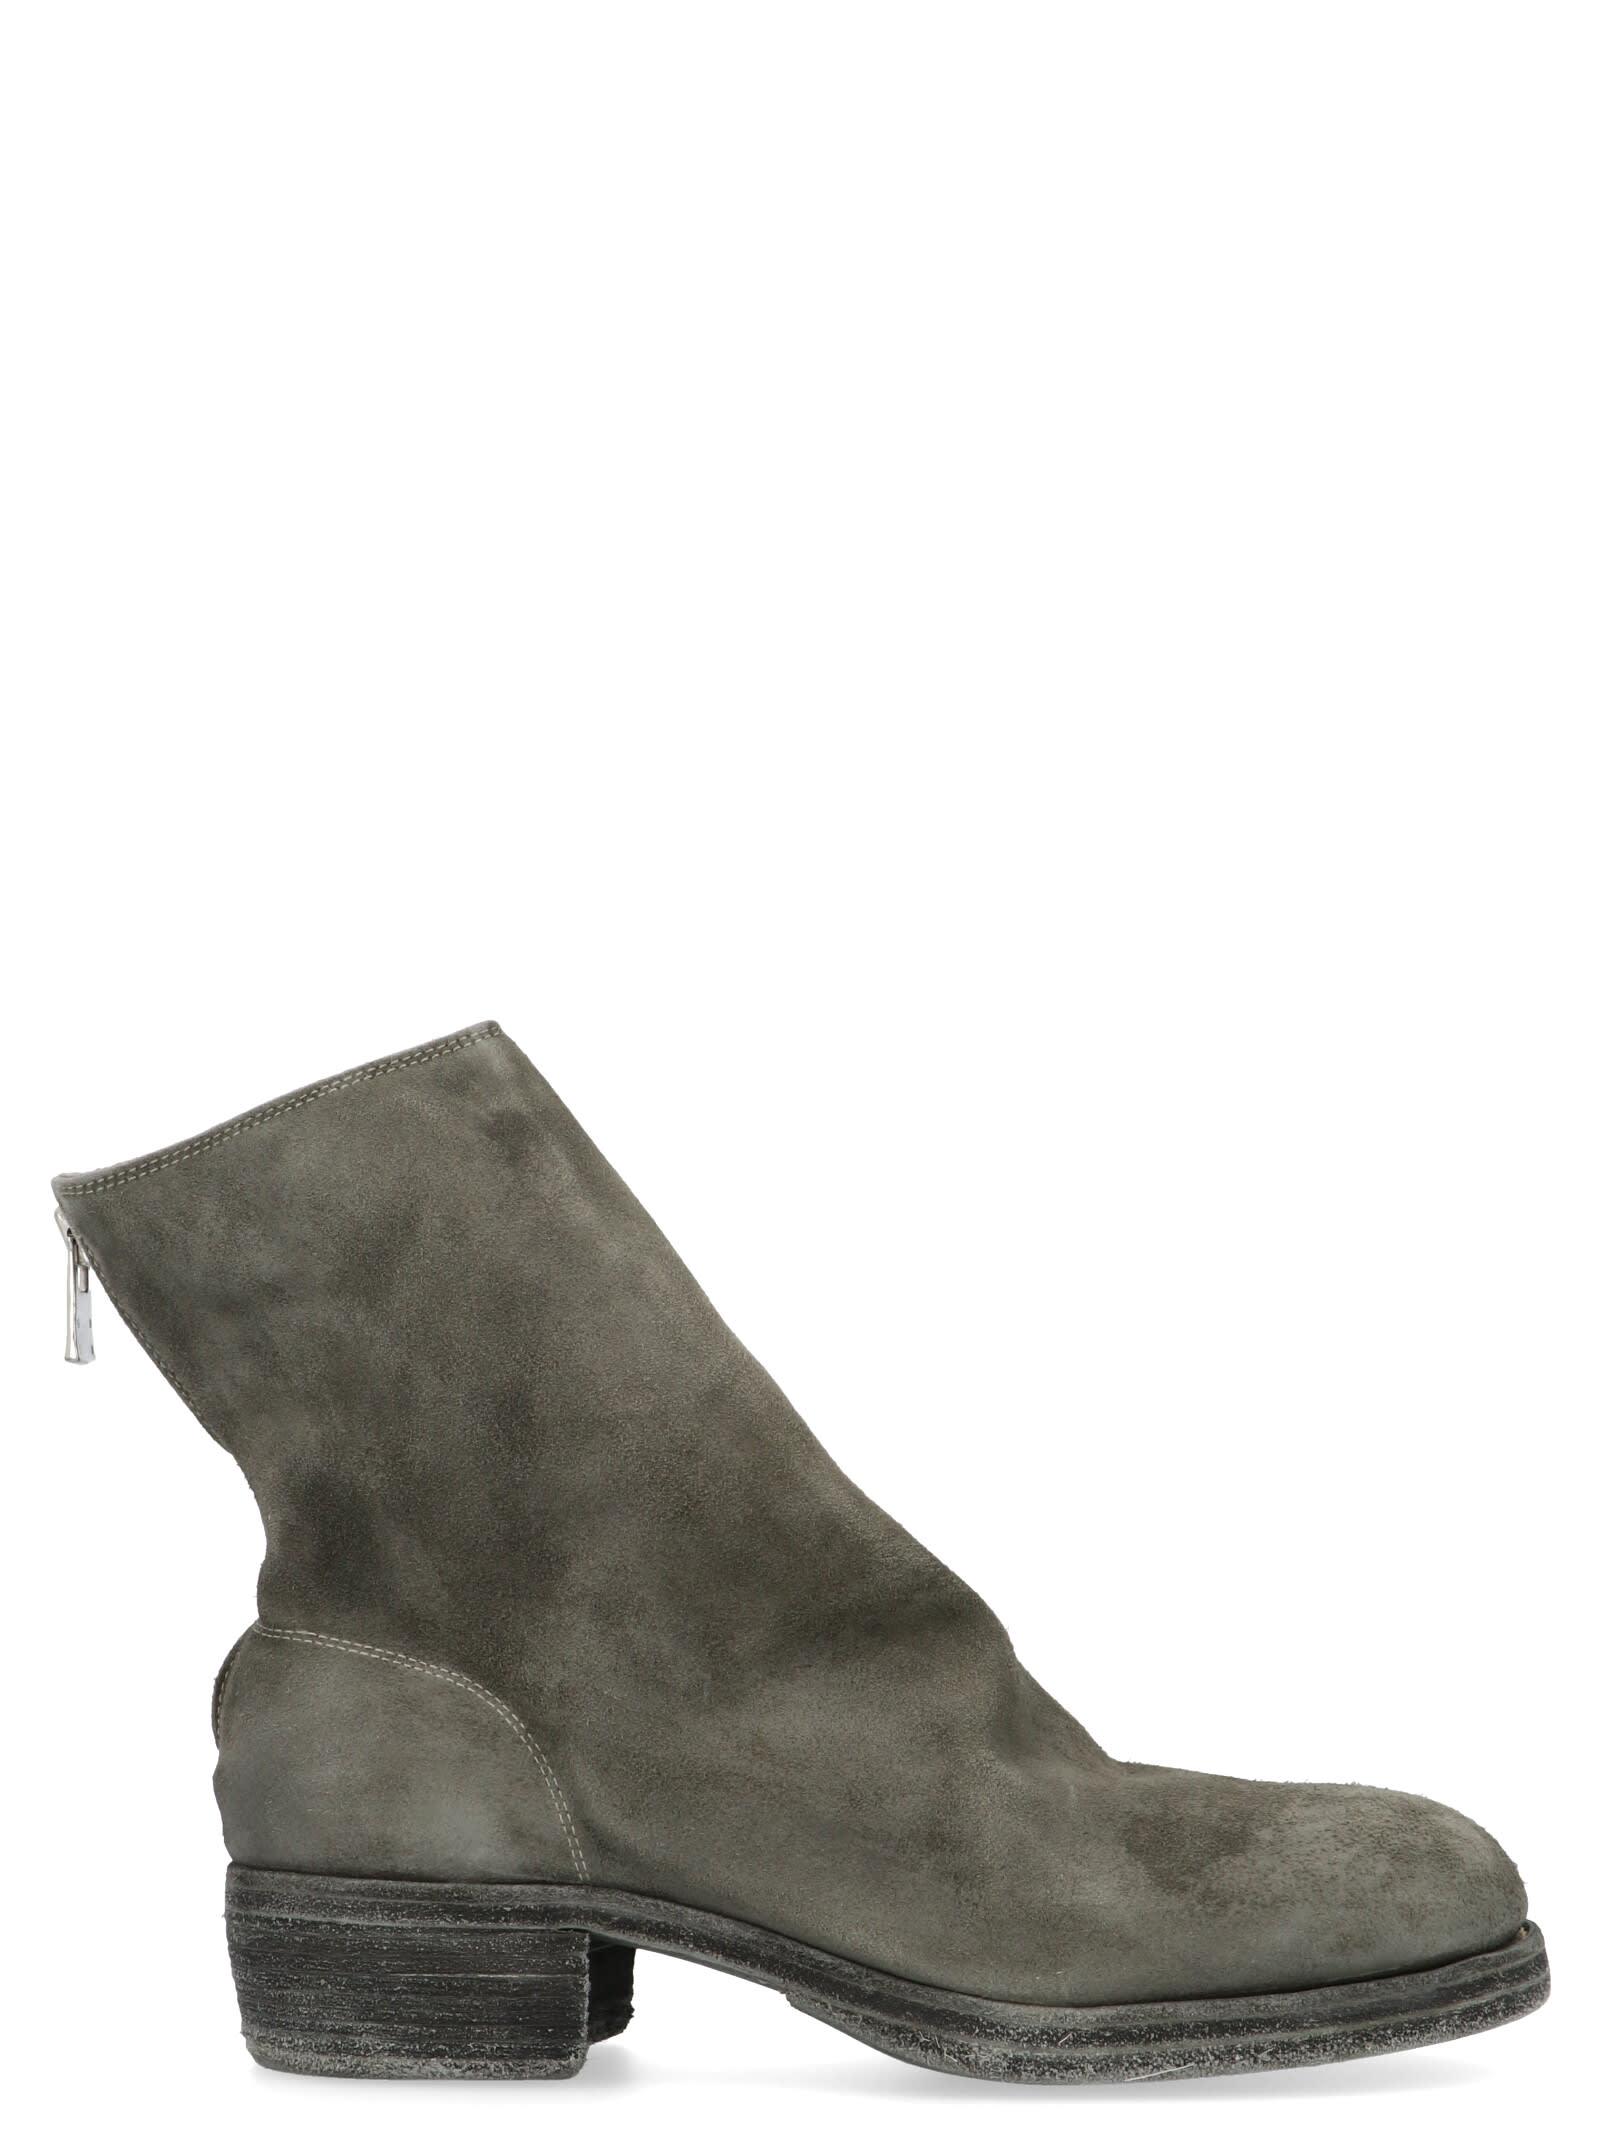 Guidi pl2 Boots